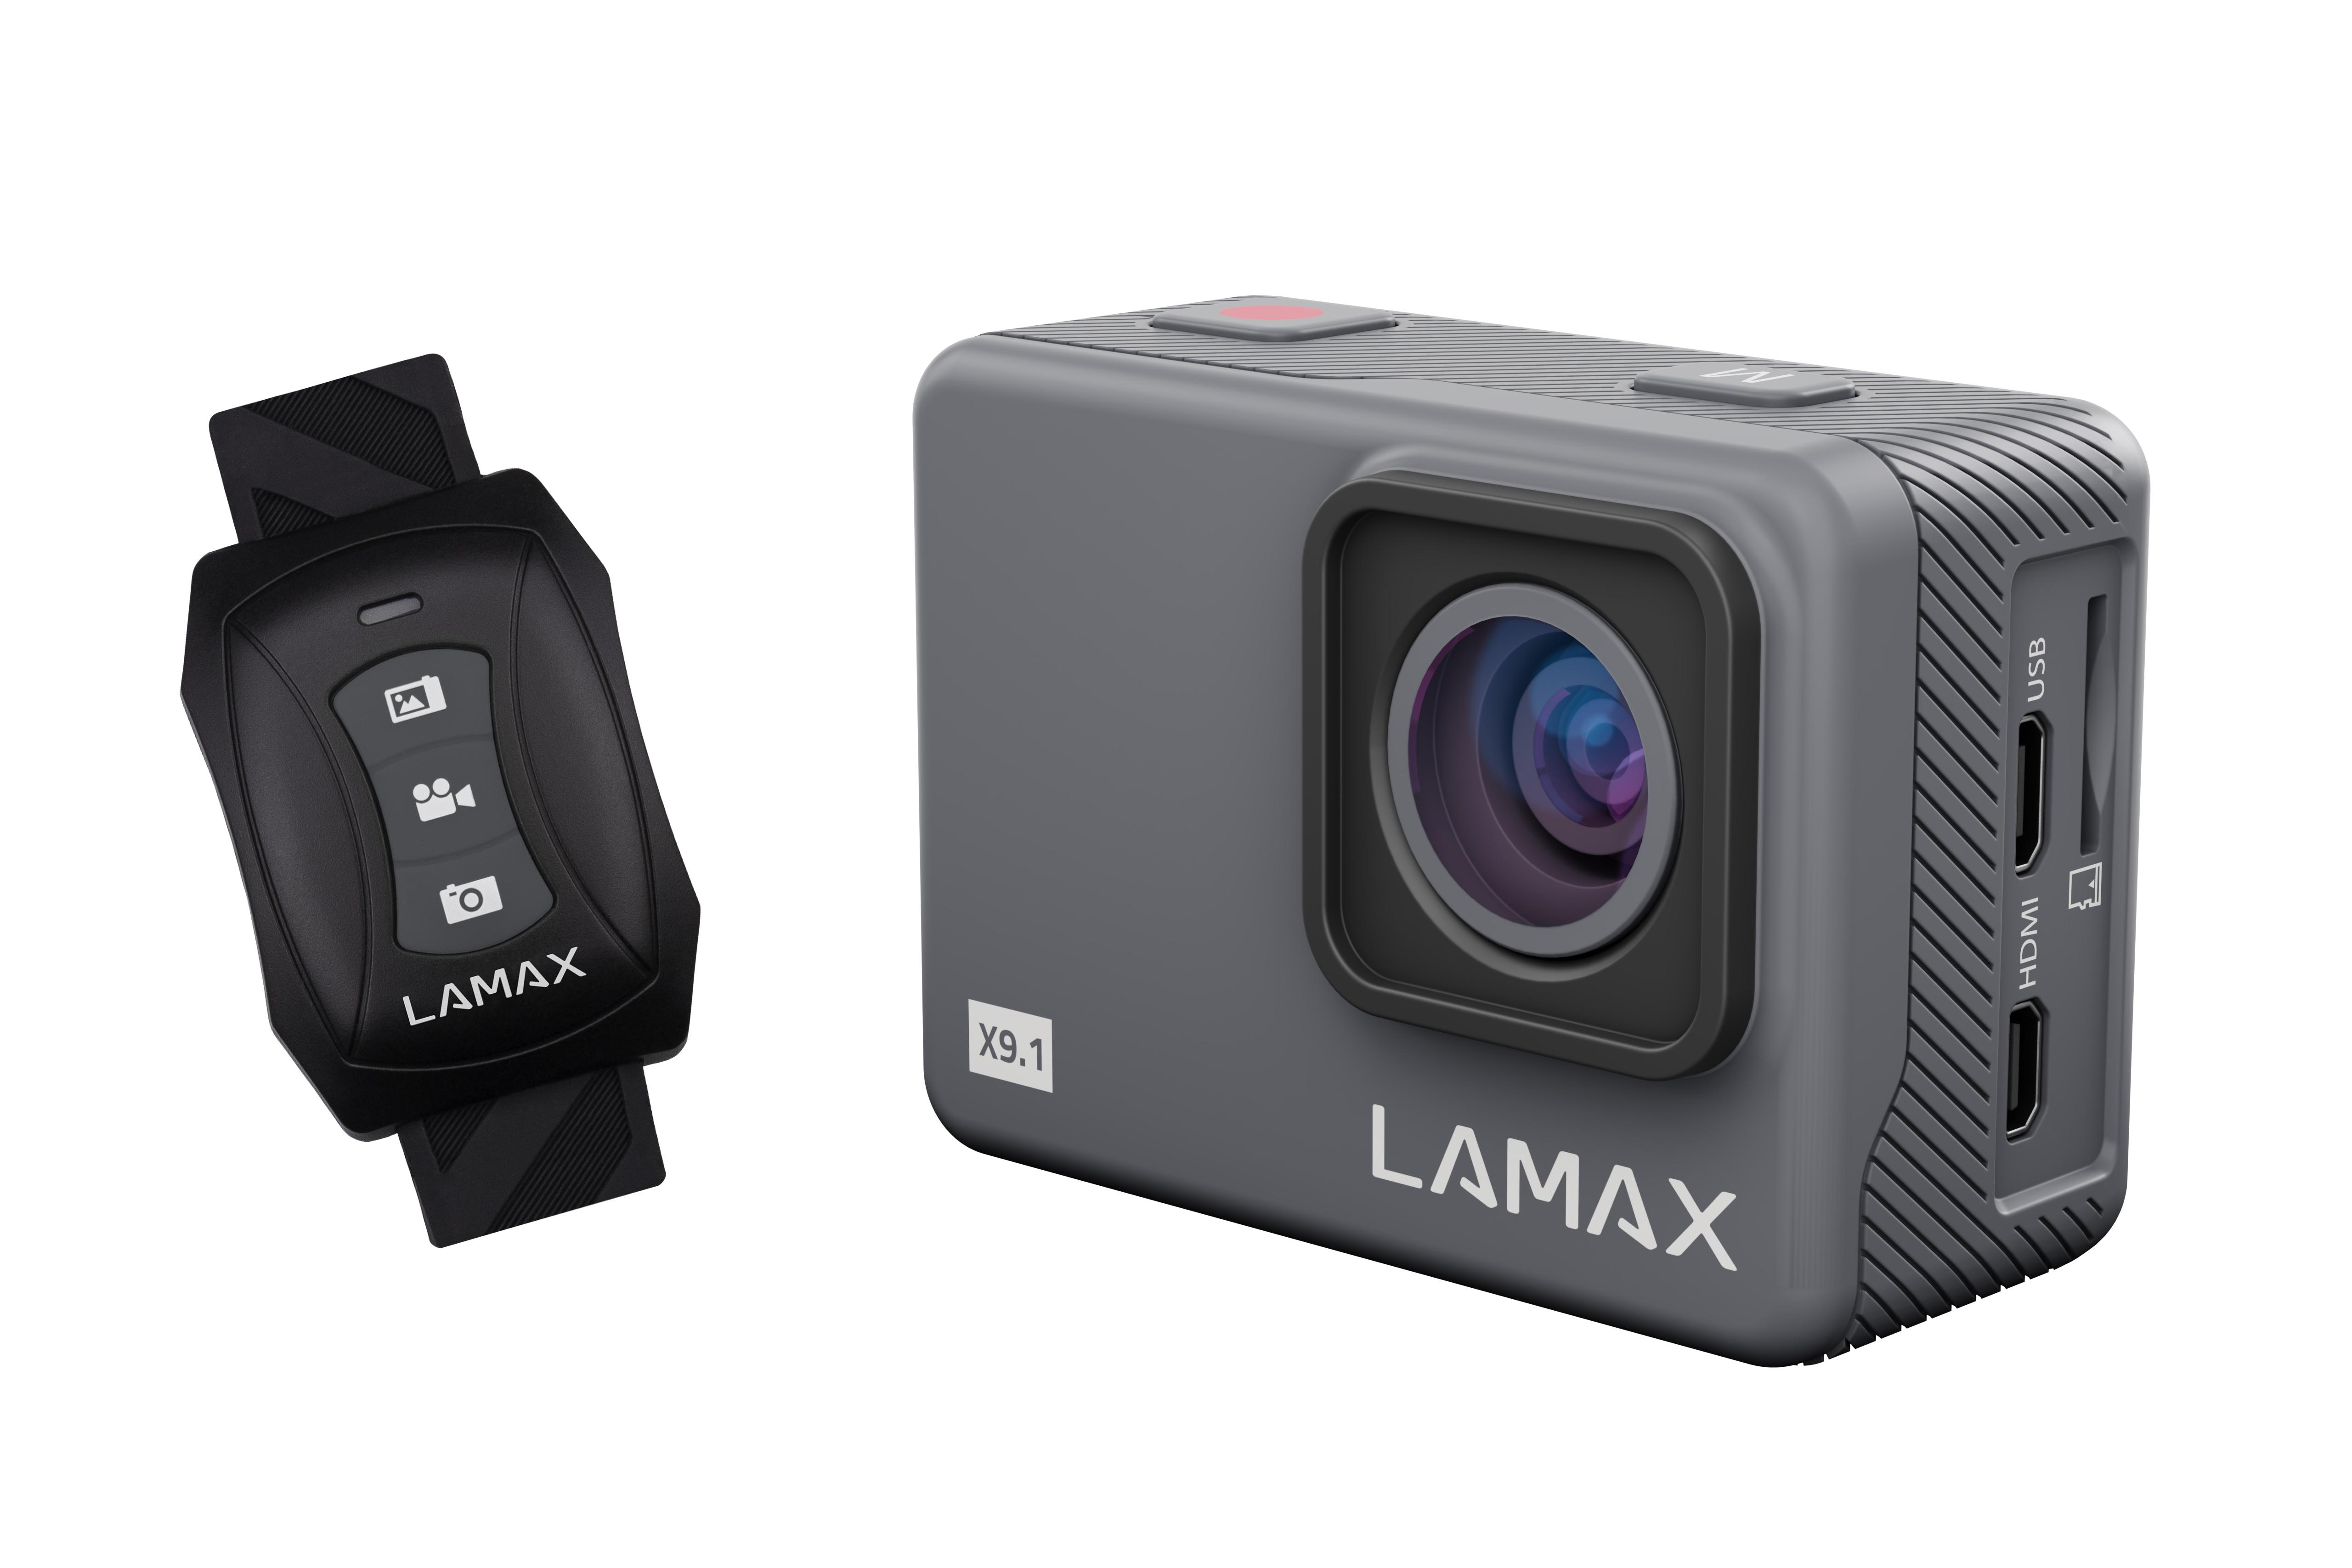 LAMAX X9.1   LAMAX Electronics   EN